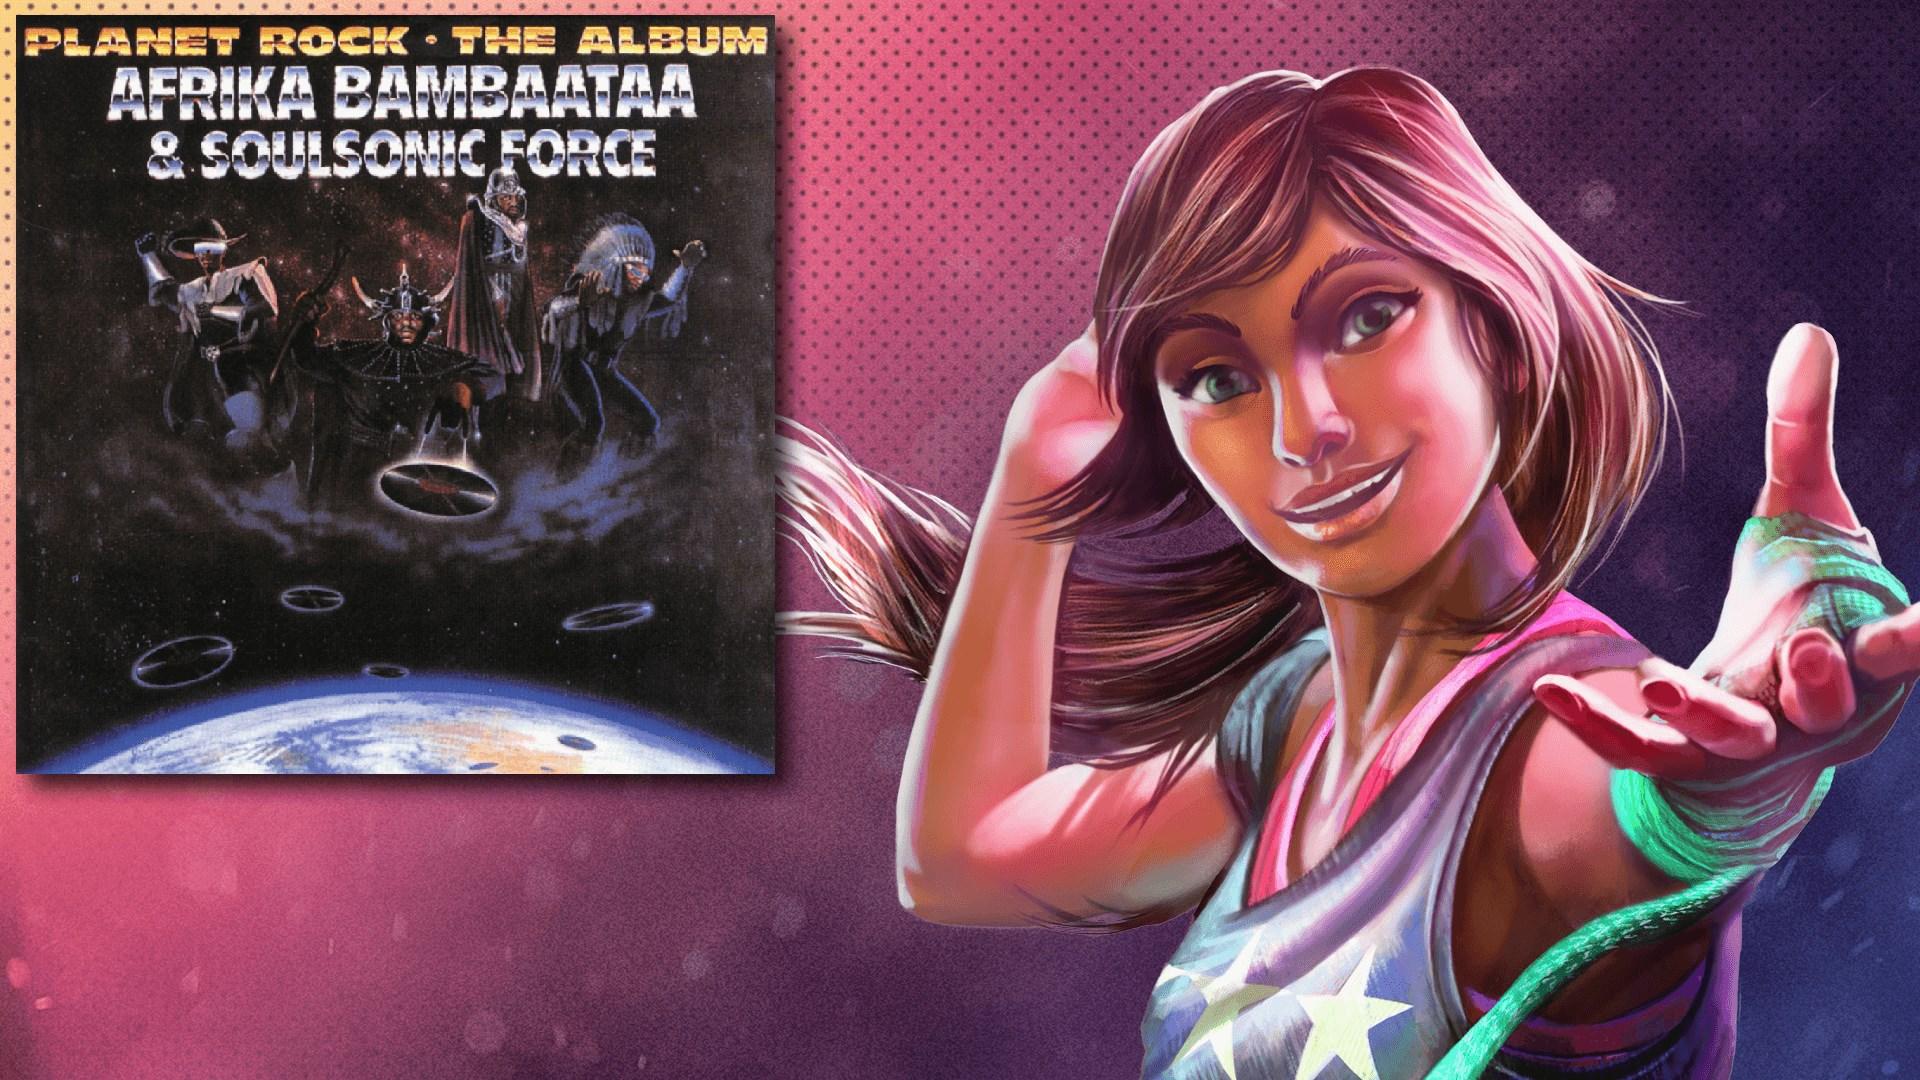 """Planet Rock (Original 12"" Version)"" – Afrika Bambaataa & The Soul Sonic Force"